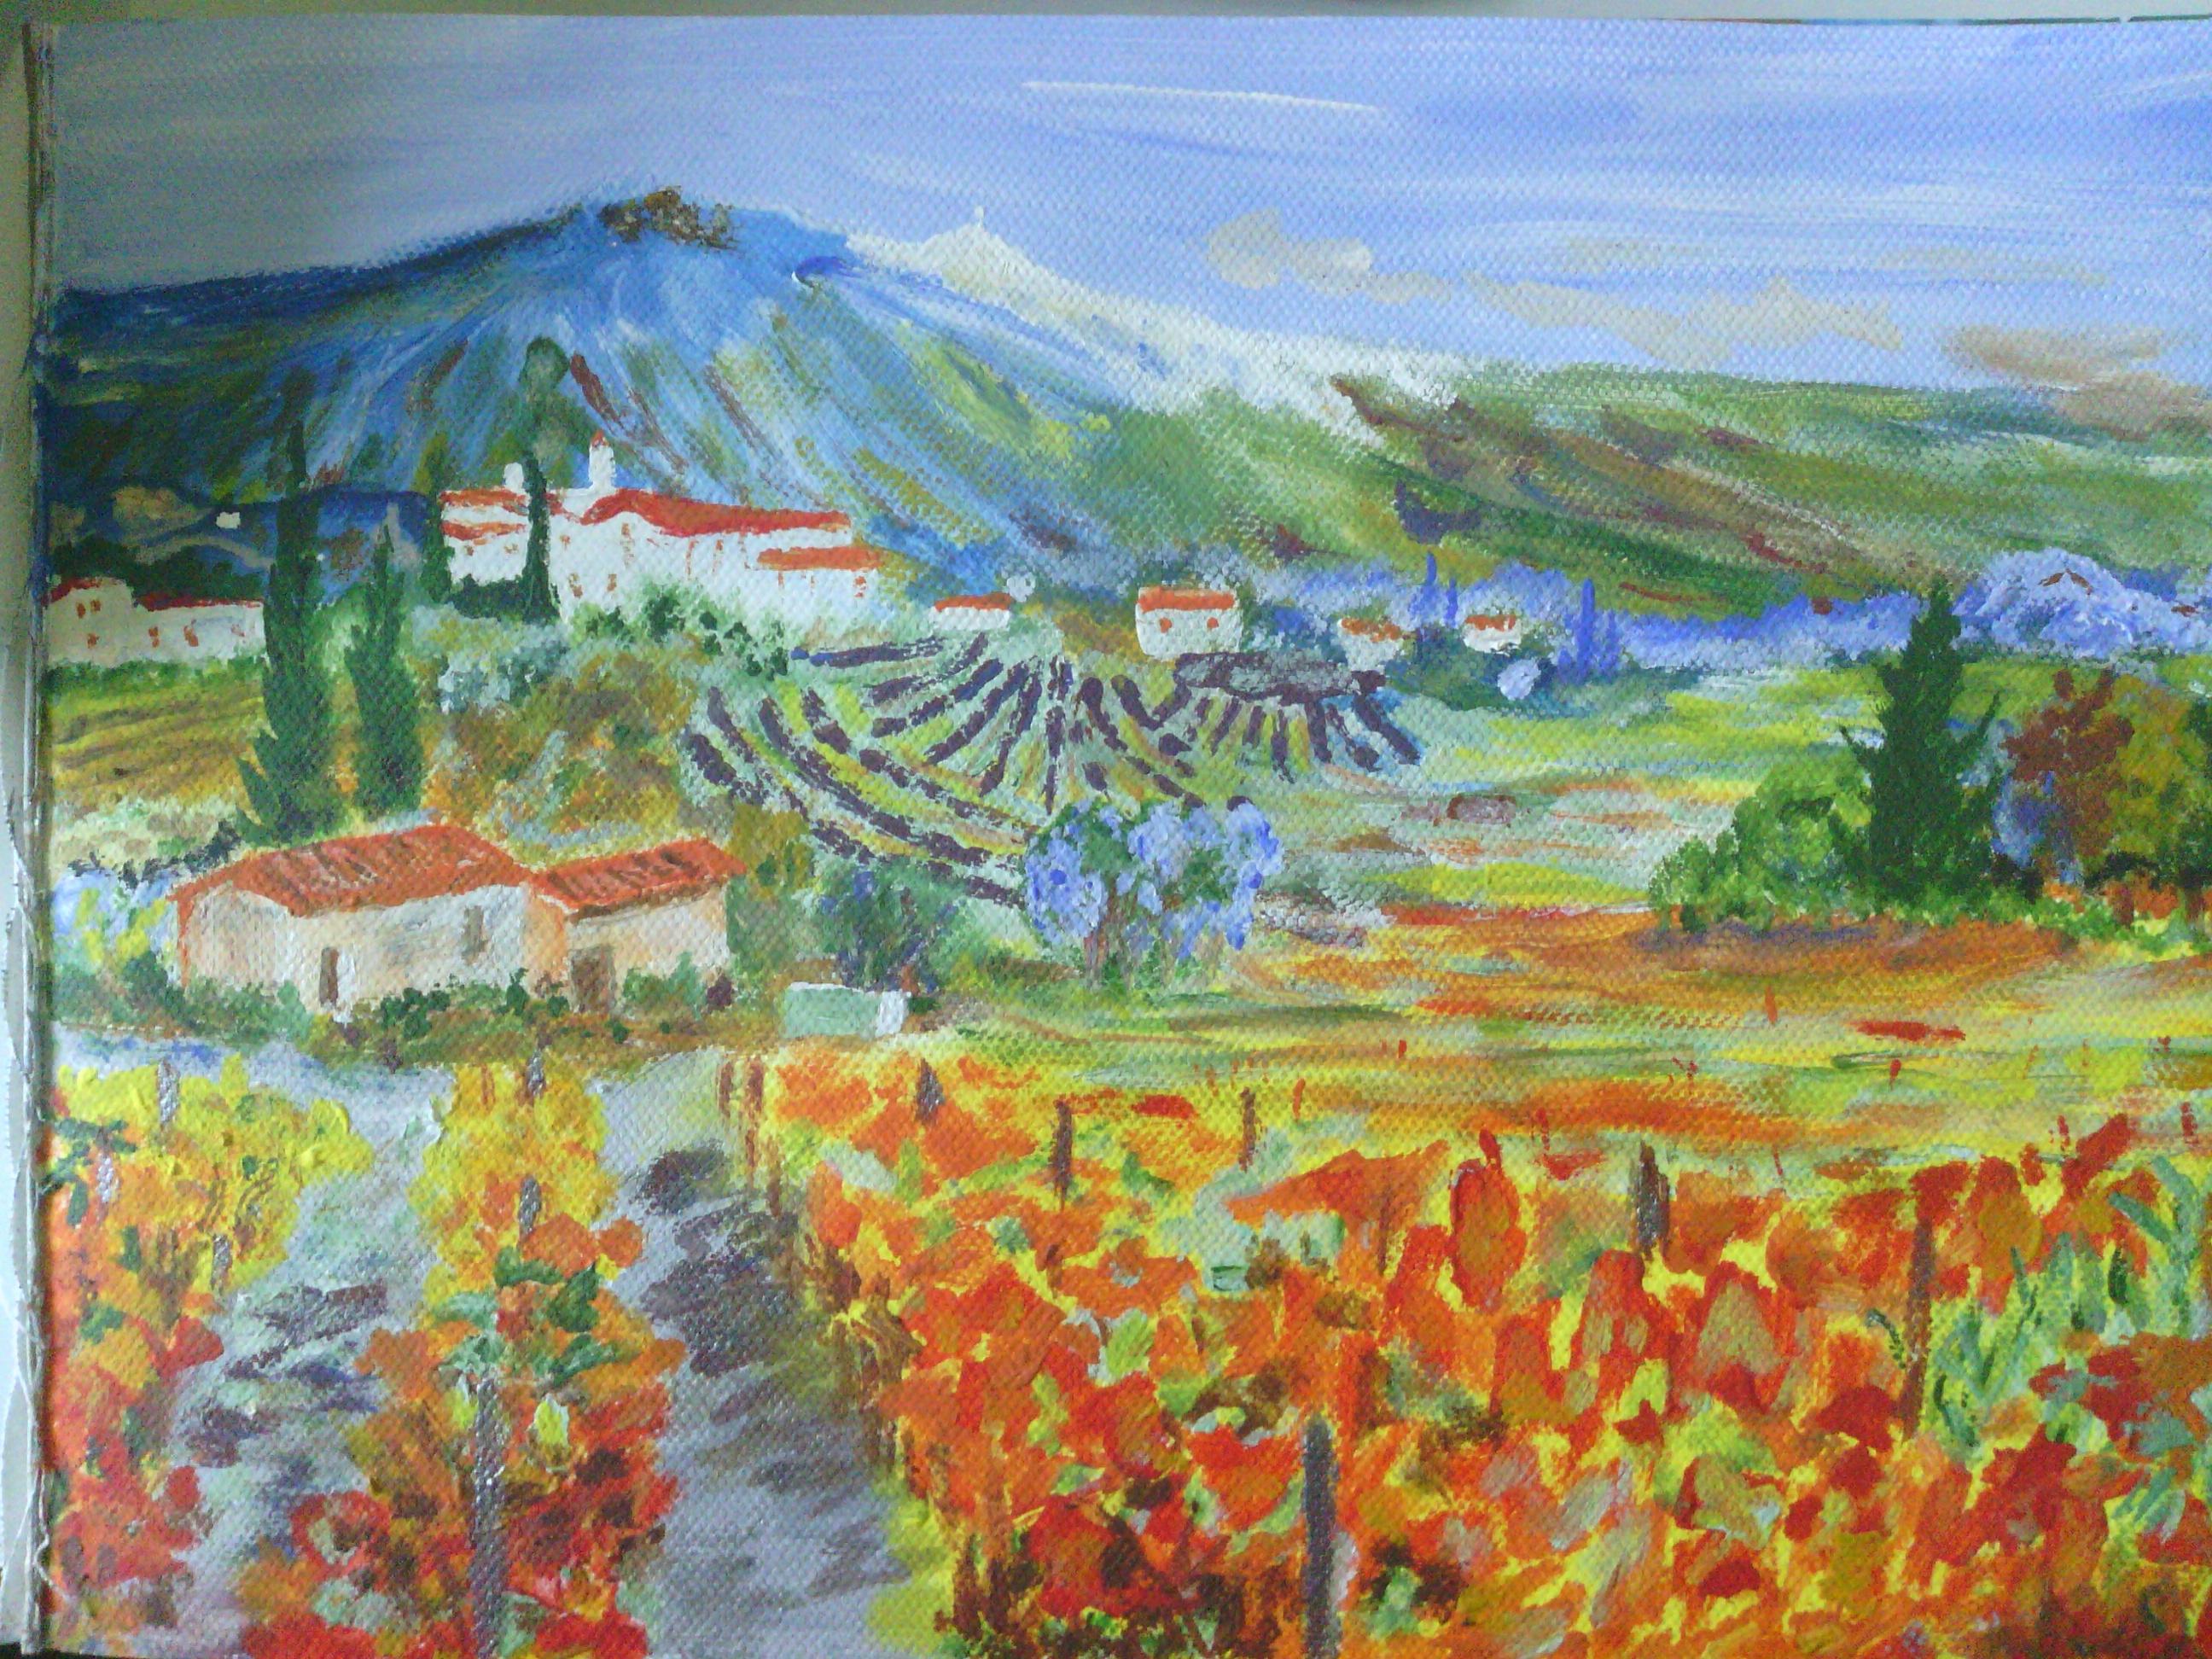 Edualc claudius paysage du mont ventoux for Peinture peinture